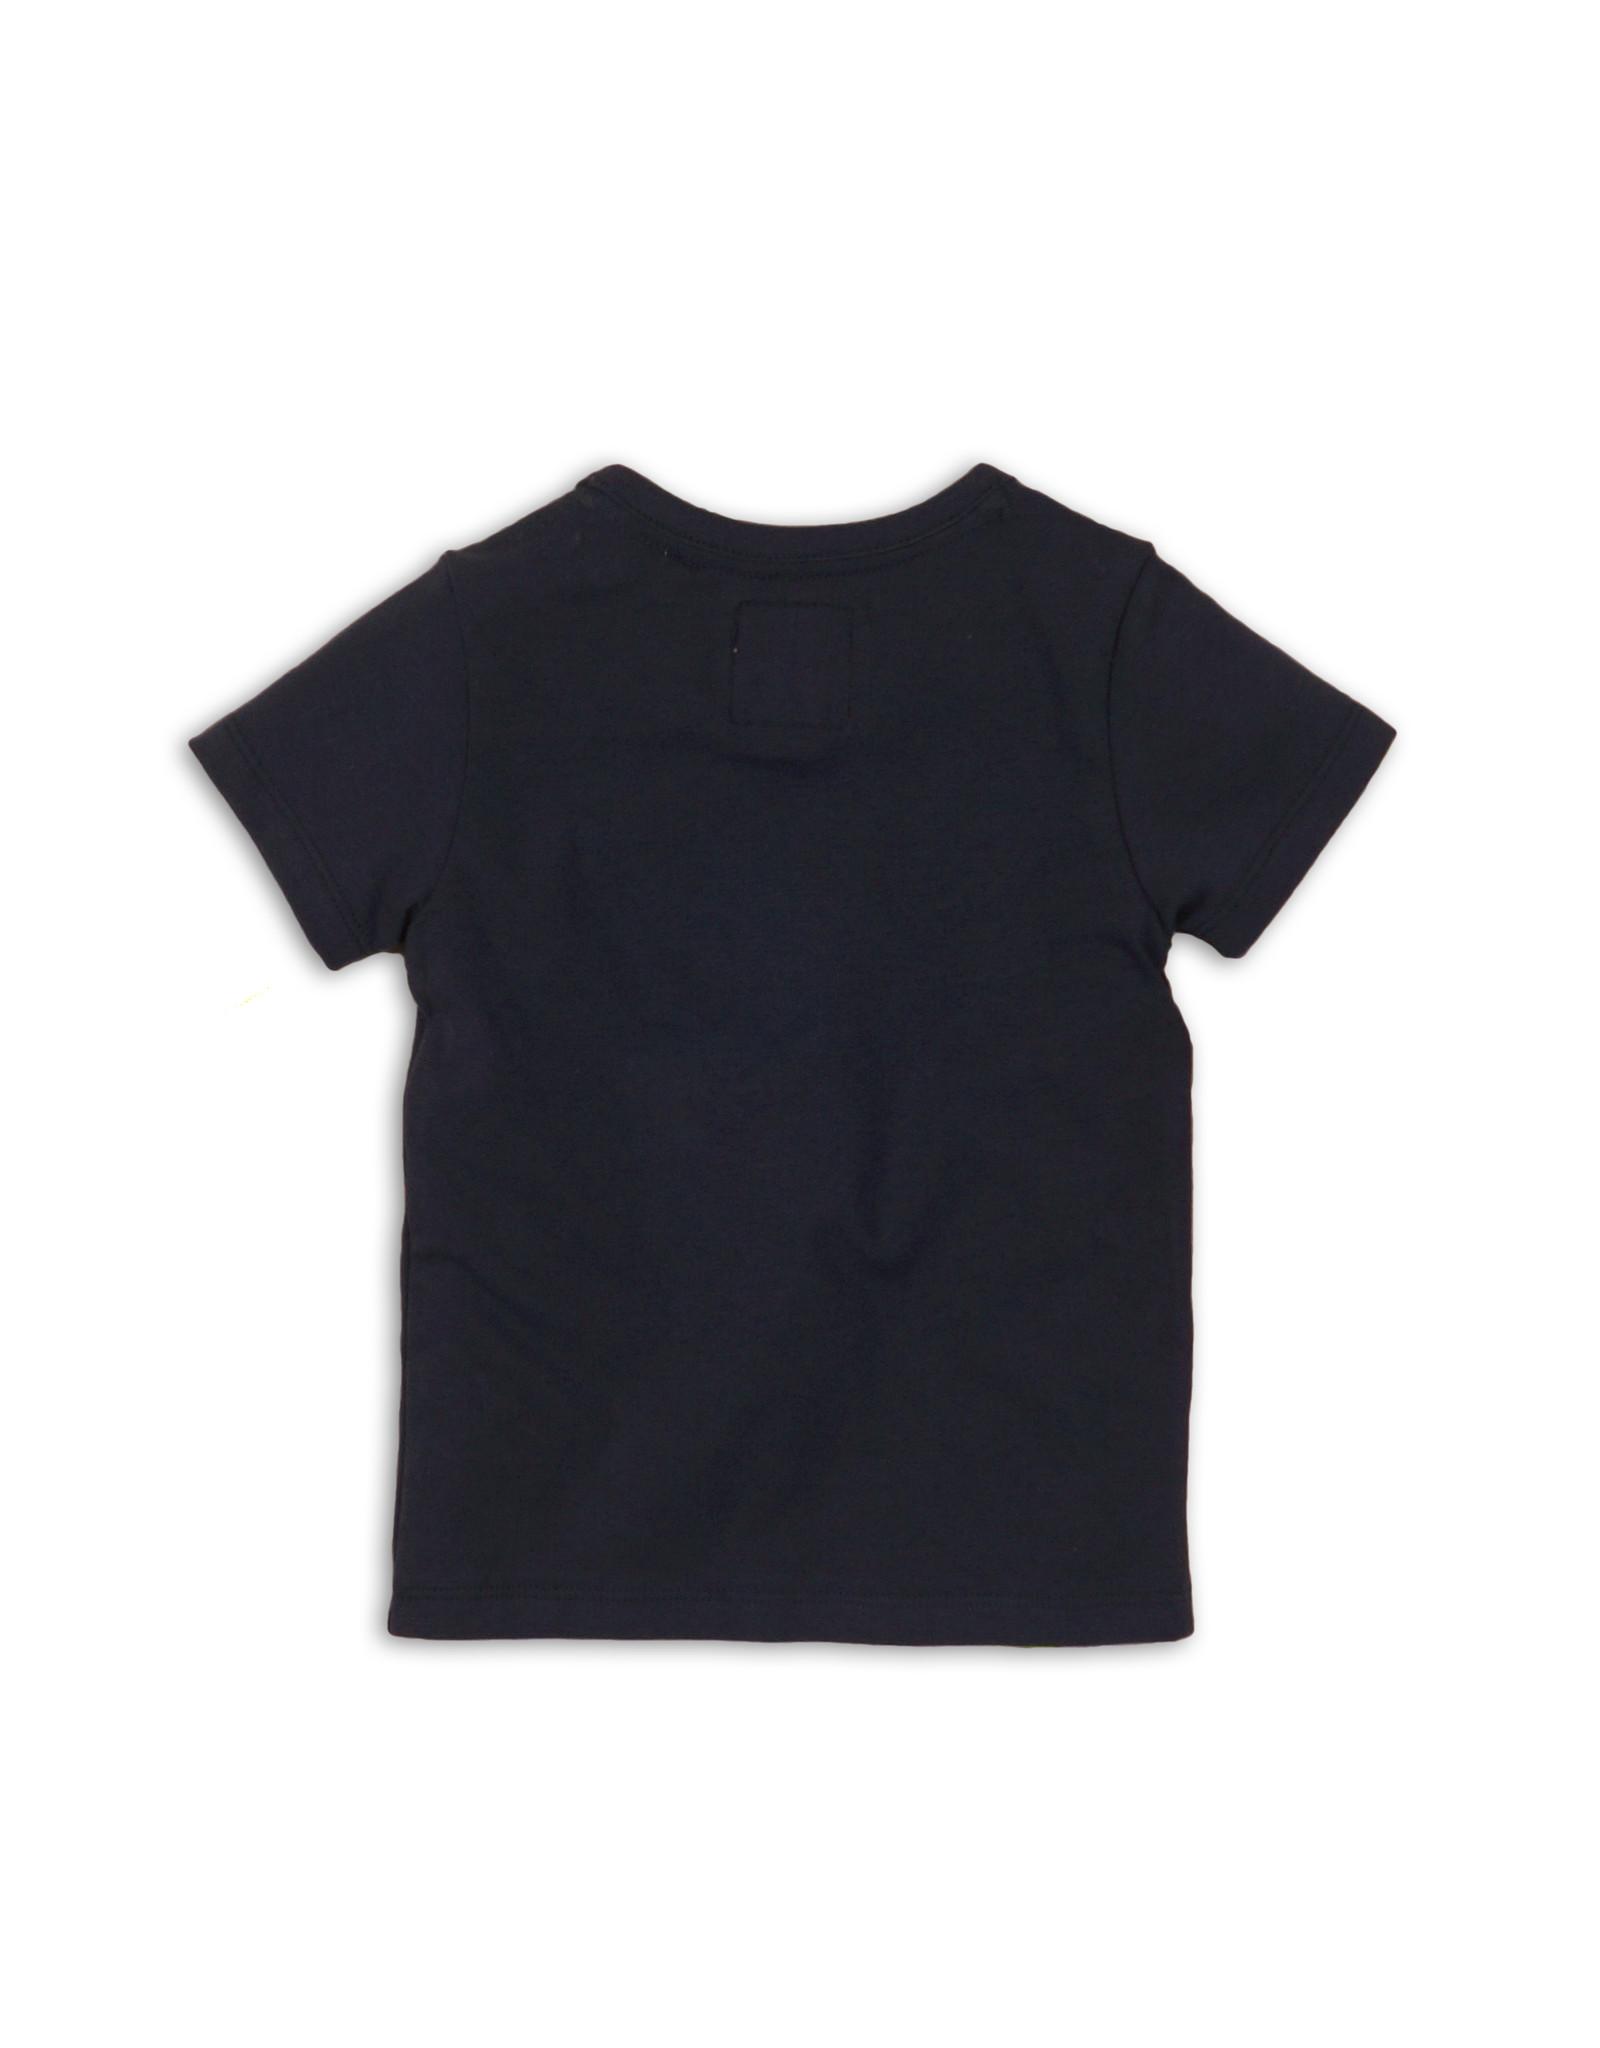 Koko Noko T-shirt navy